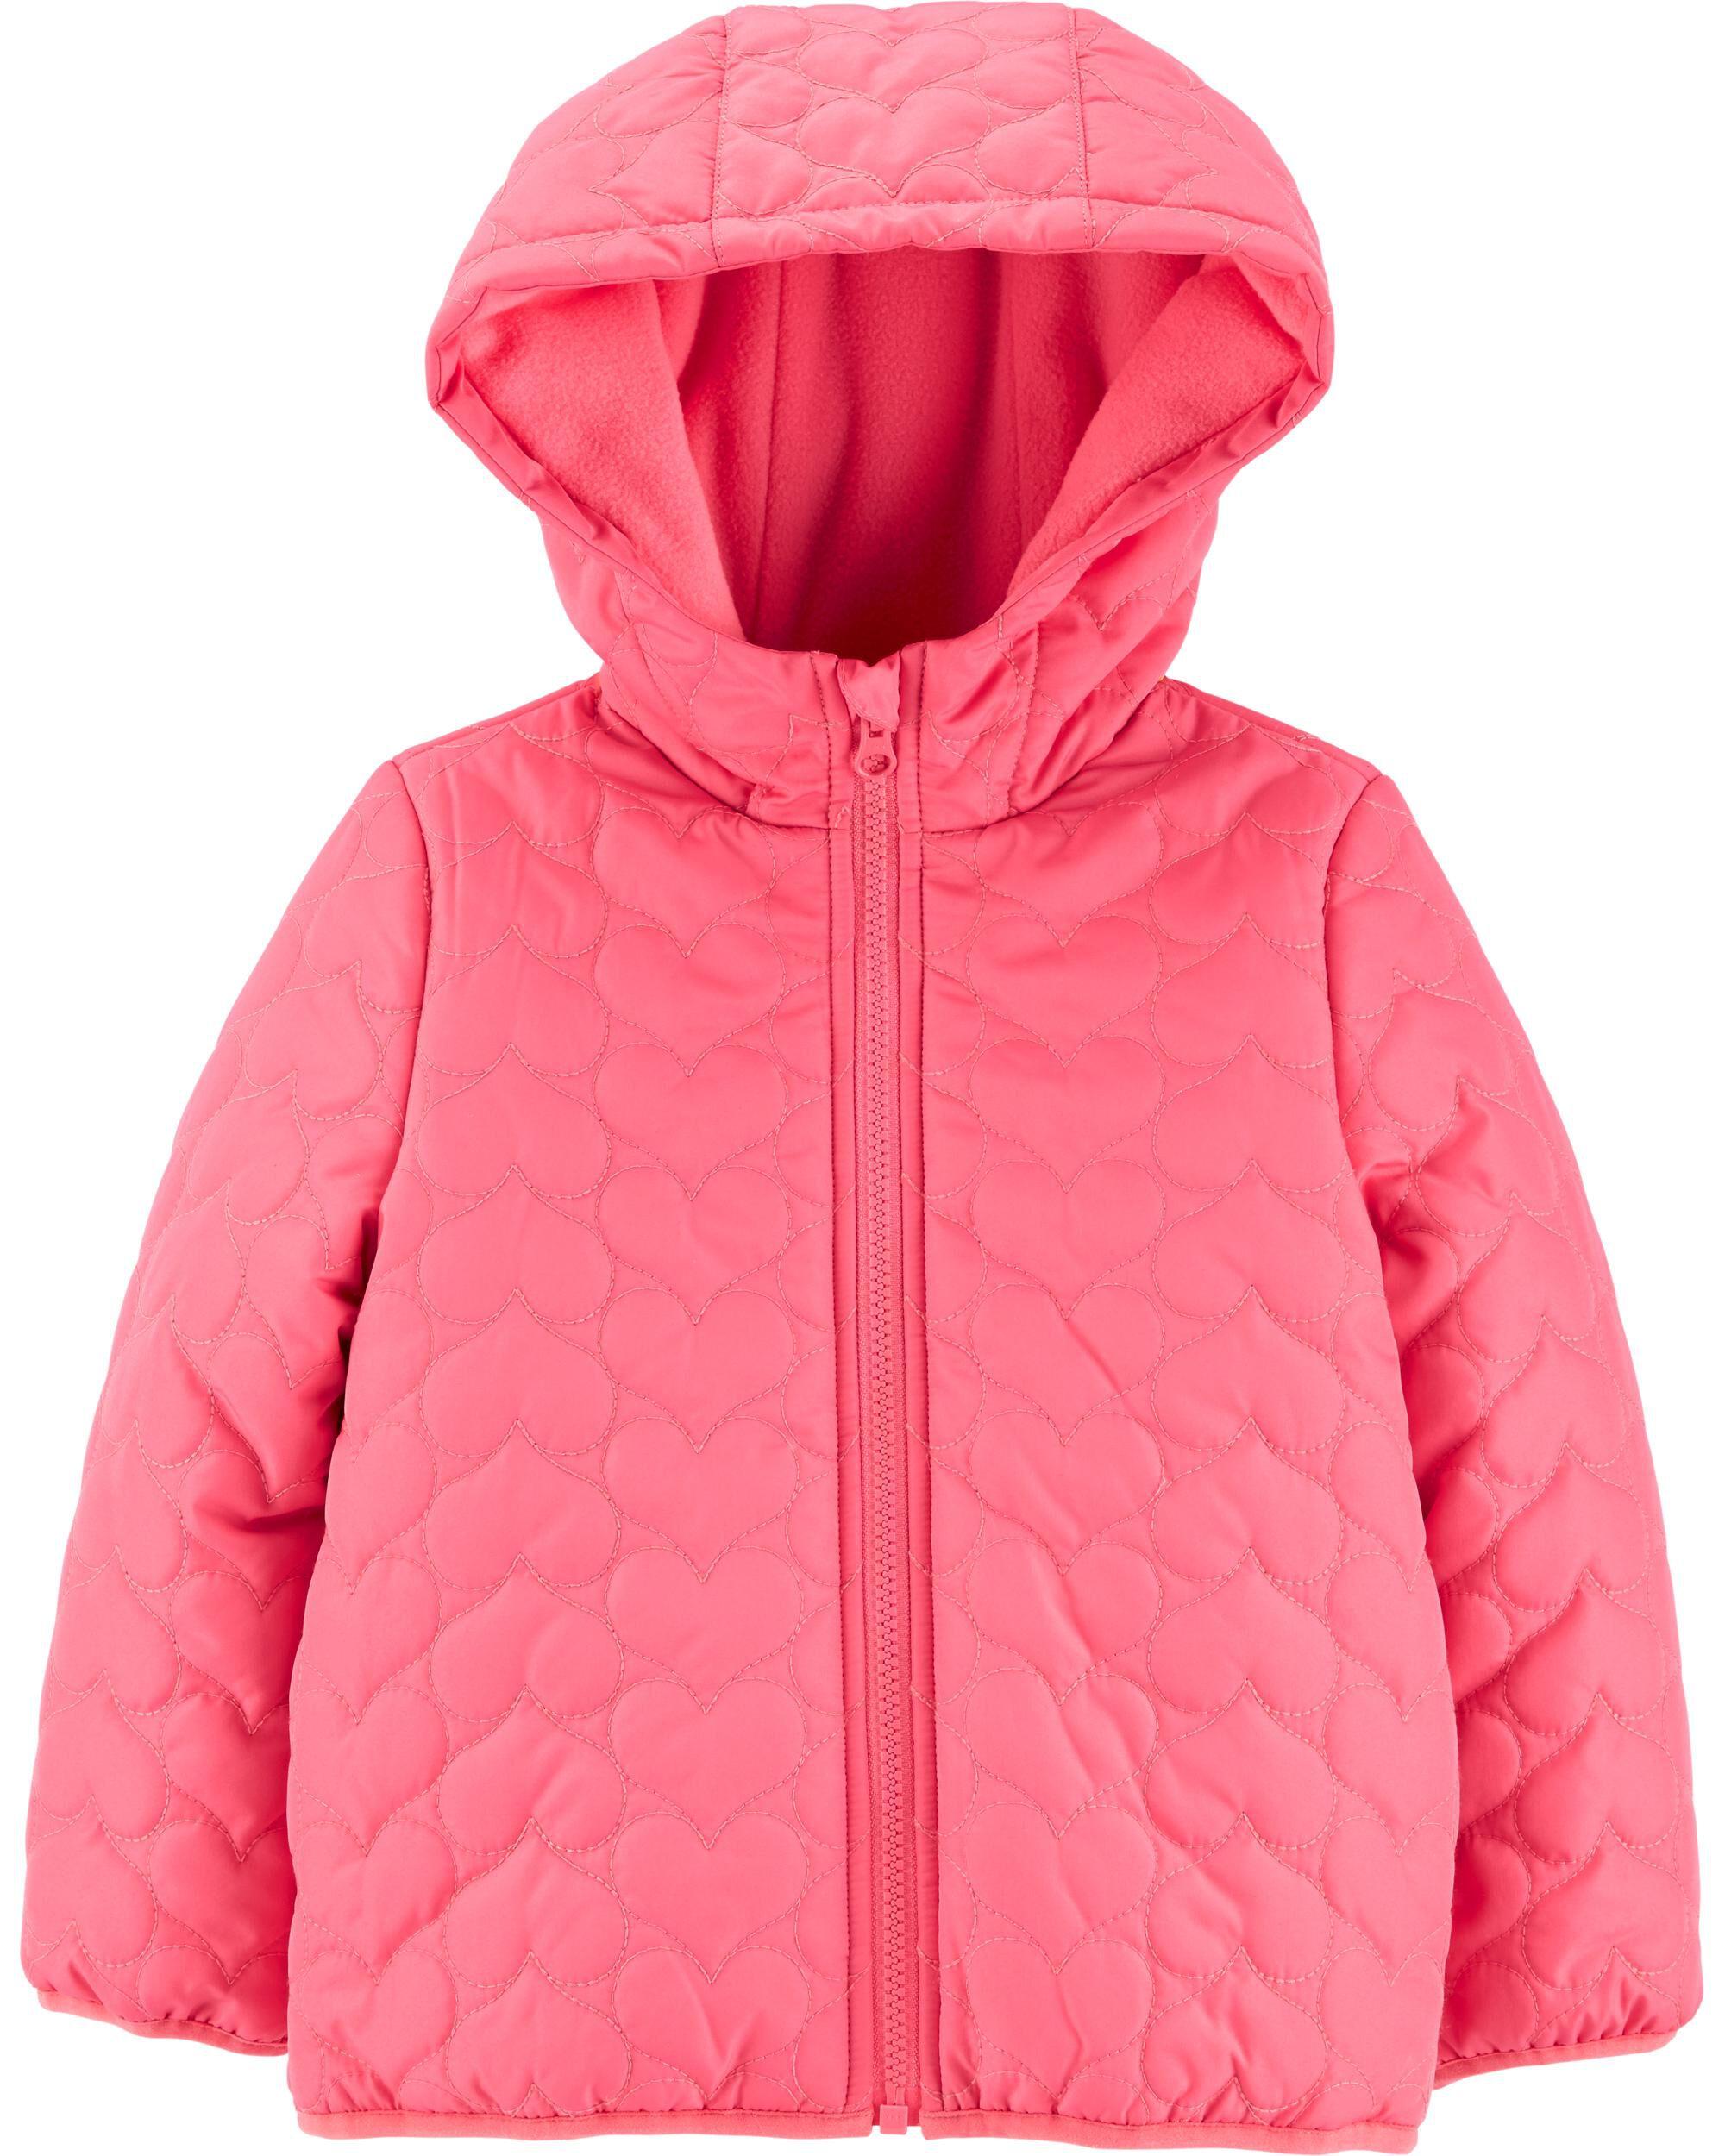 Carter/'s Toddler Girls Pink Classic Heavyweight Puffer Jacket Size 2T 3T 4T